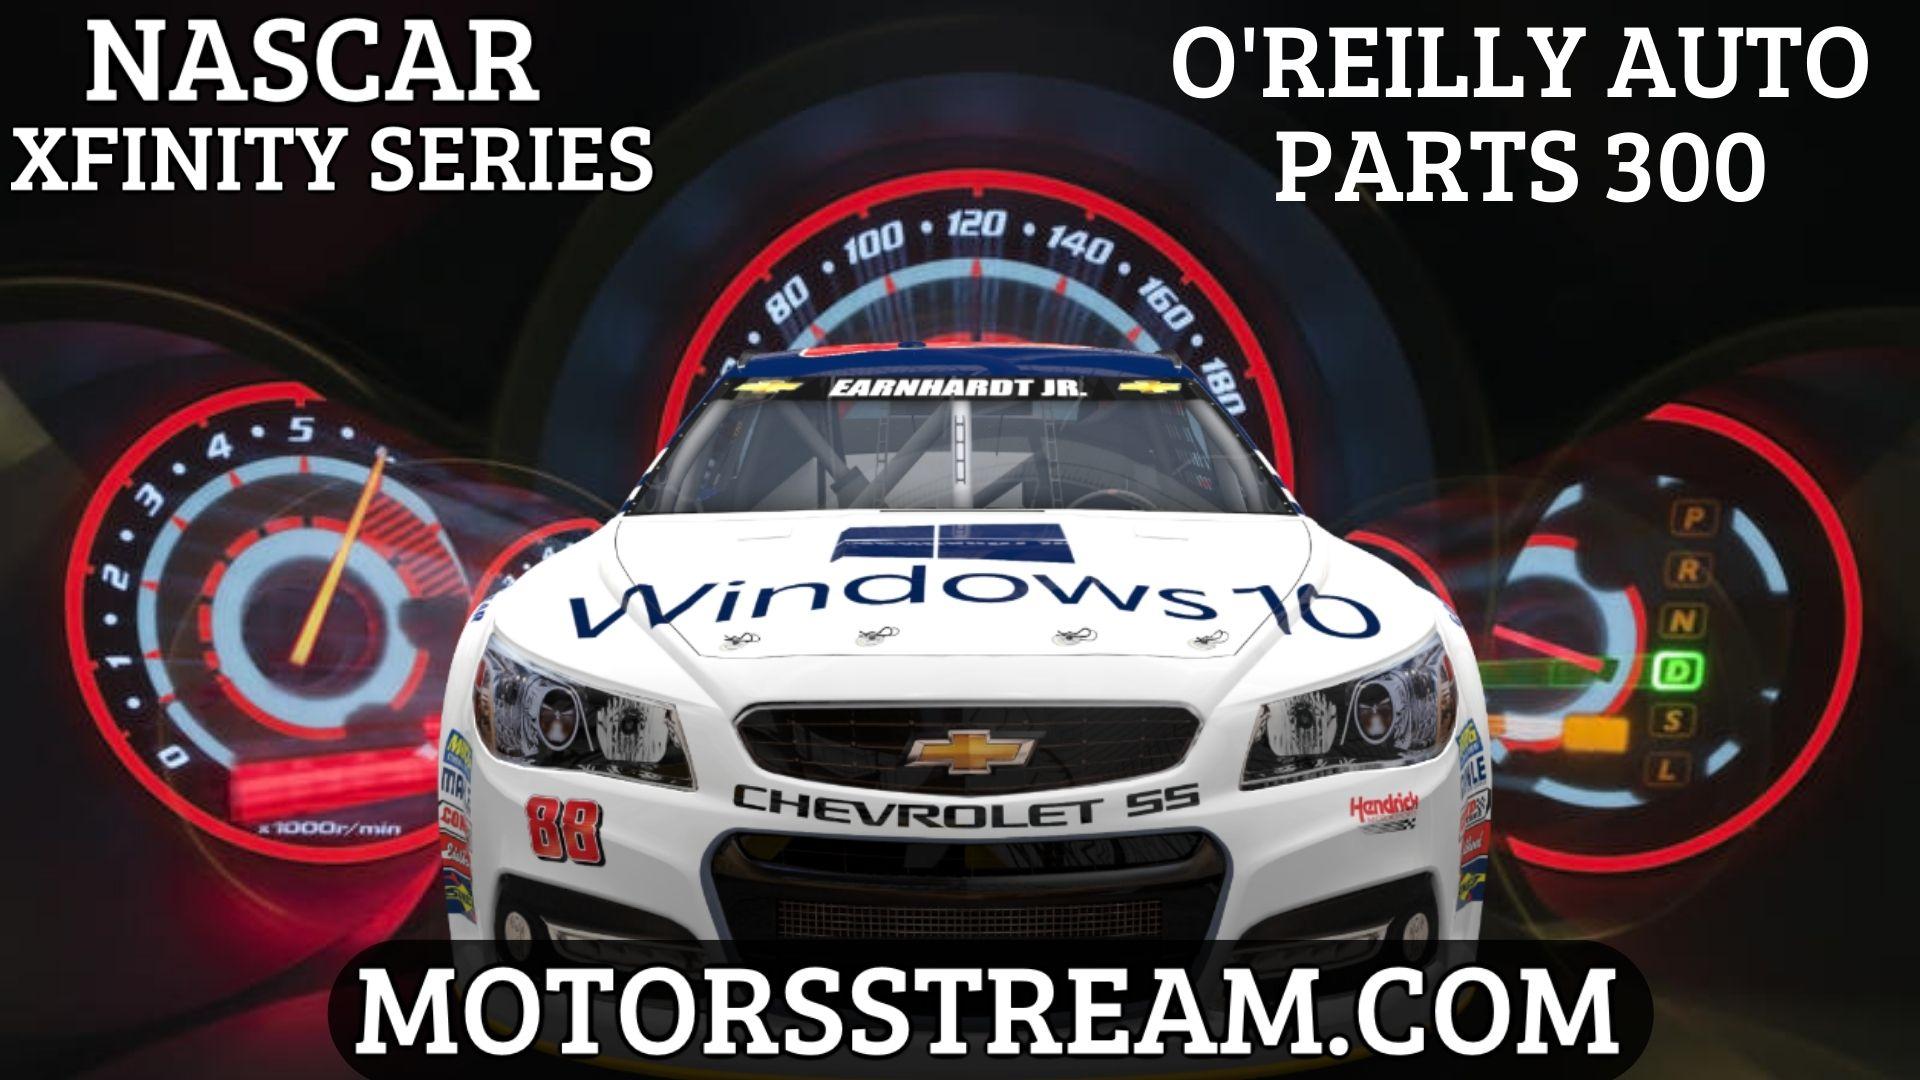 O Reilly Auto Parts 300 Live Stream | NASCAR Xfinity 2021